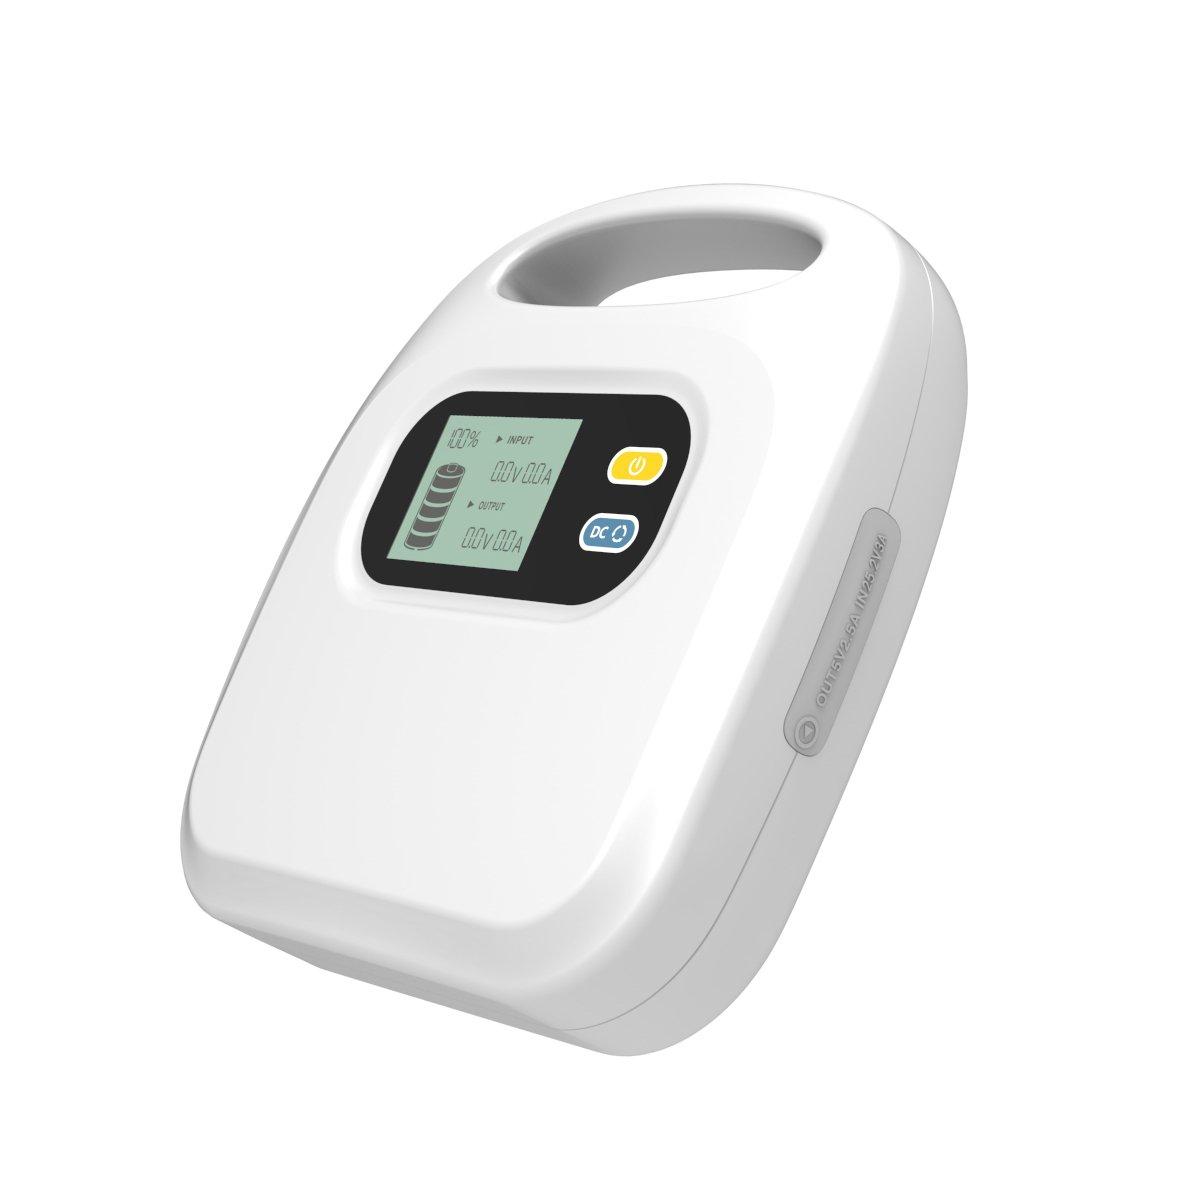 MAXOAK Power Pack External Battery Charger for CPAP/ BiPAP Machine (82500mAh,12V/15V/24V,4A) …